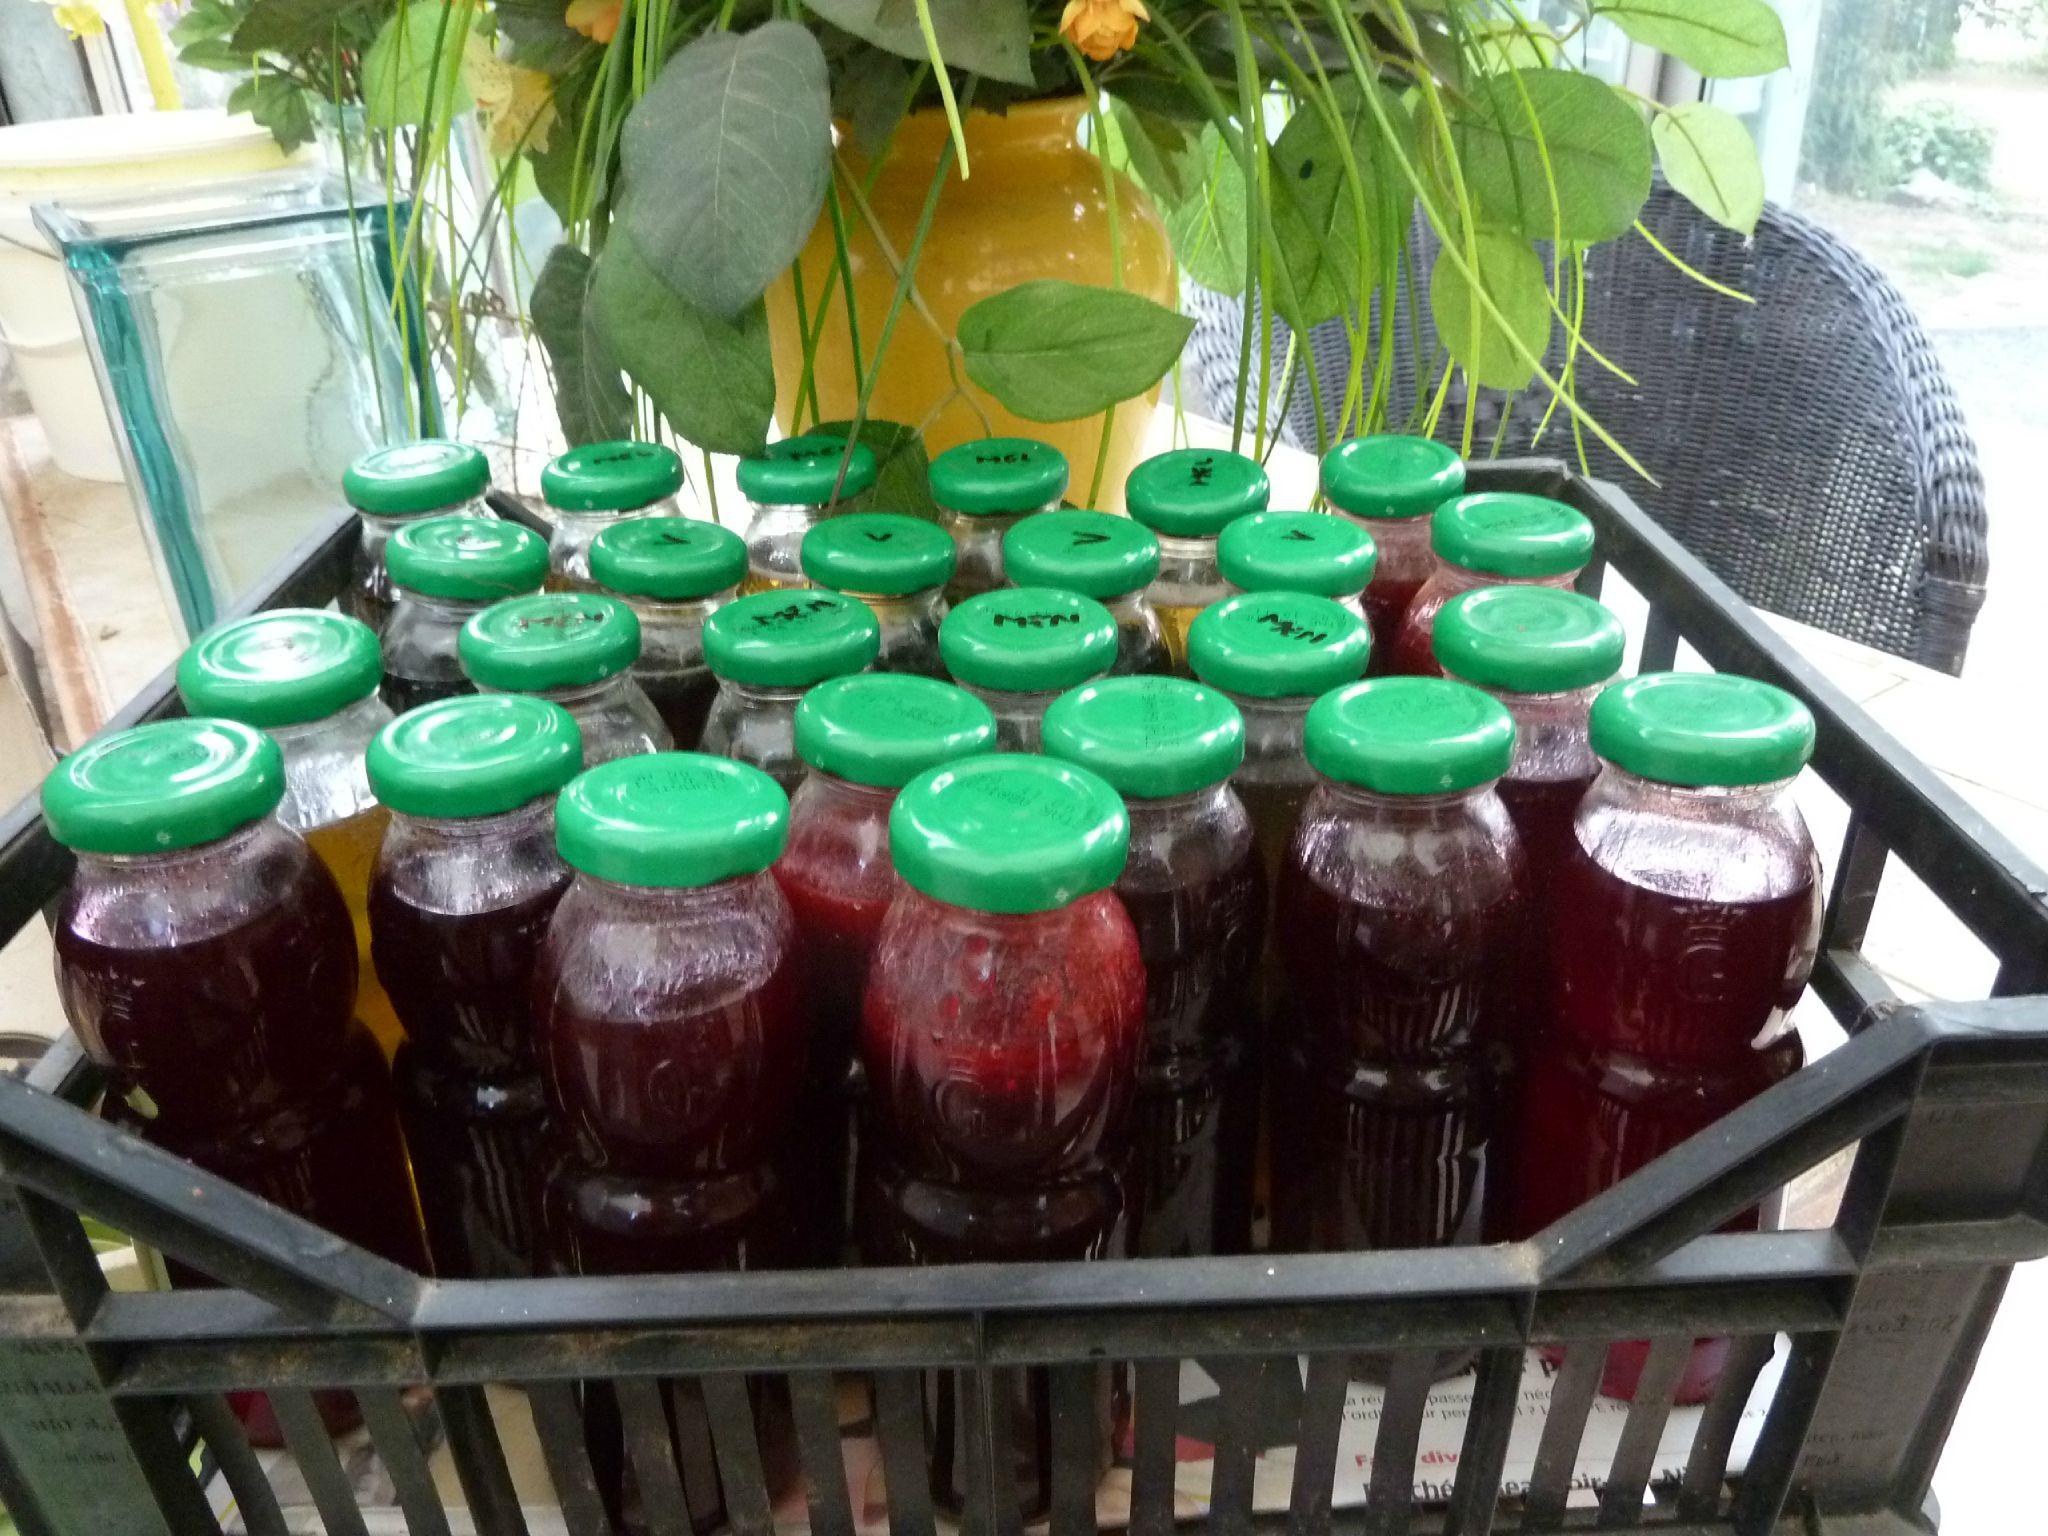 conserves de sirop de framboises - www.passionpotager.canalblog.com